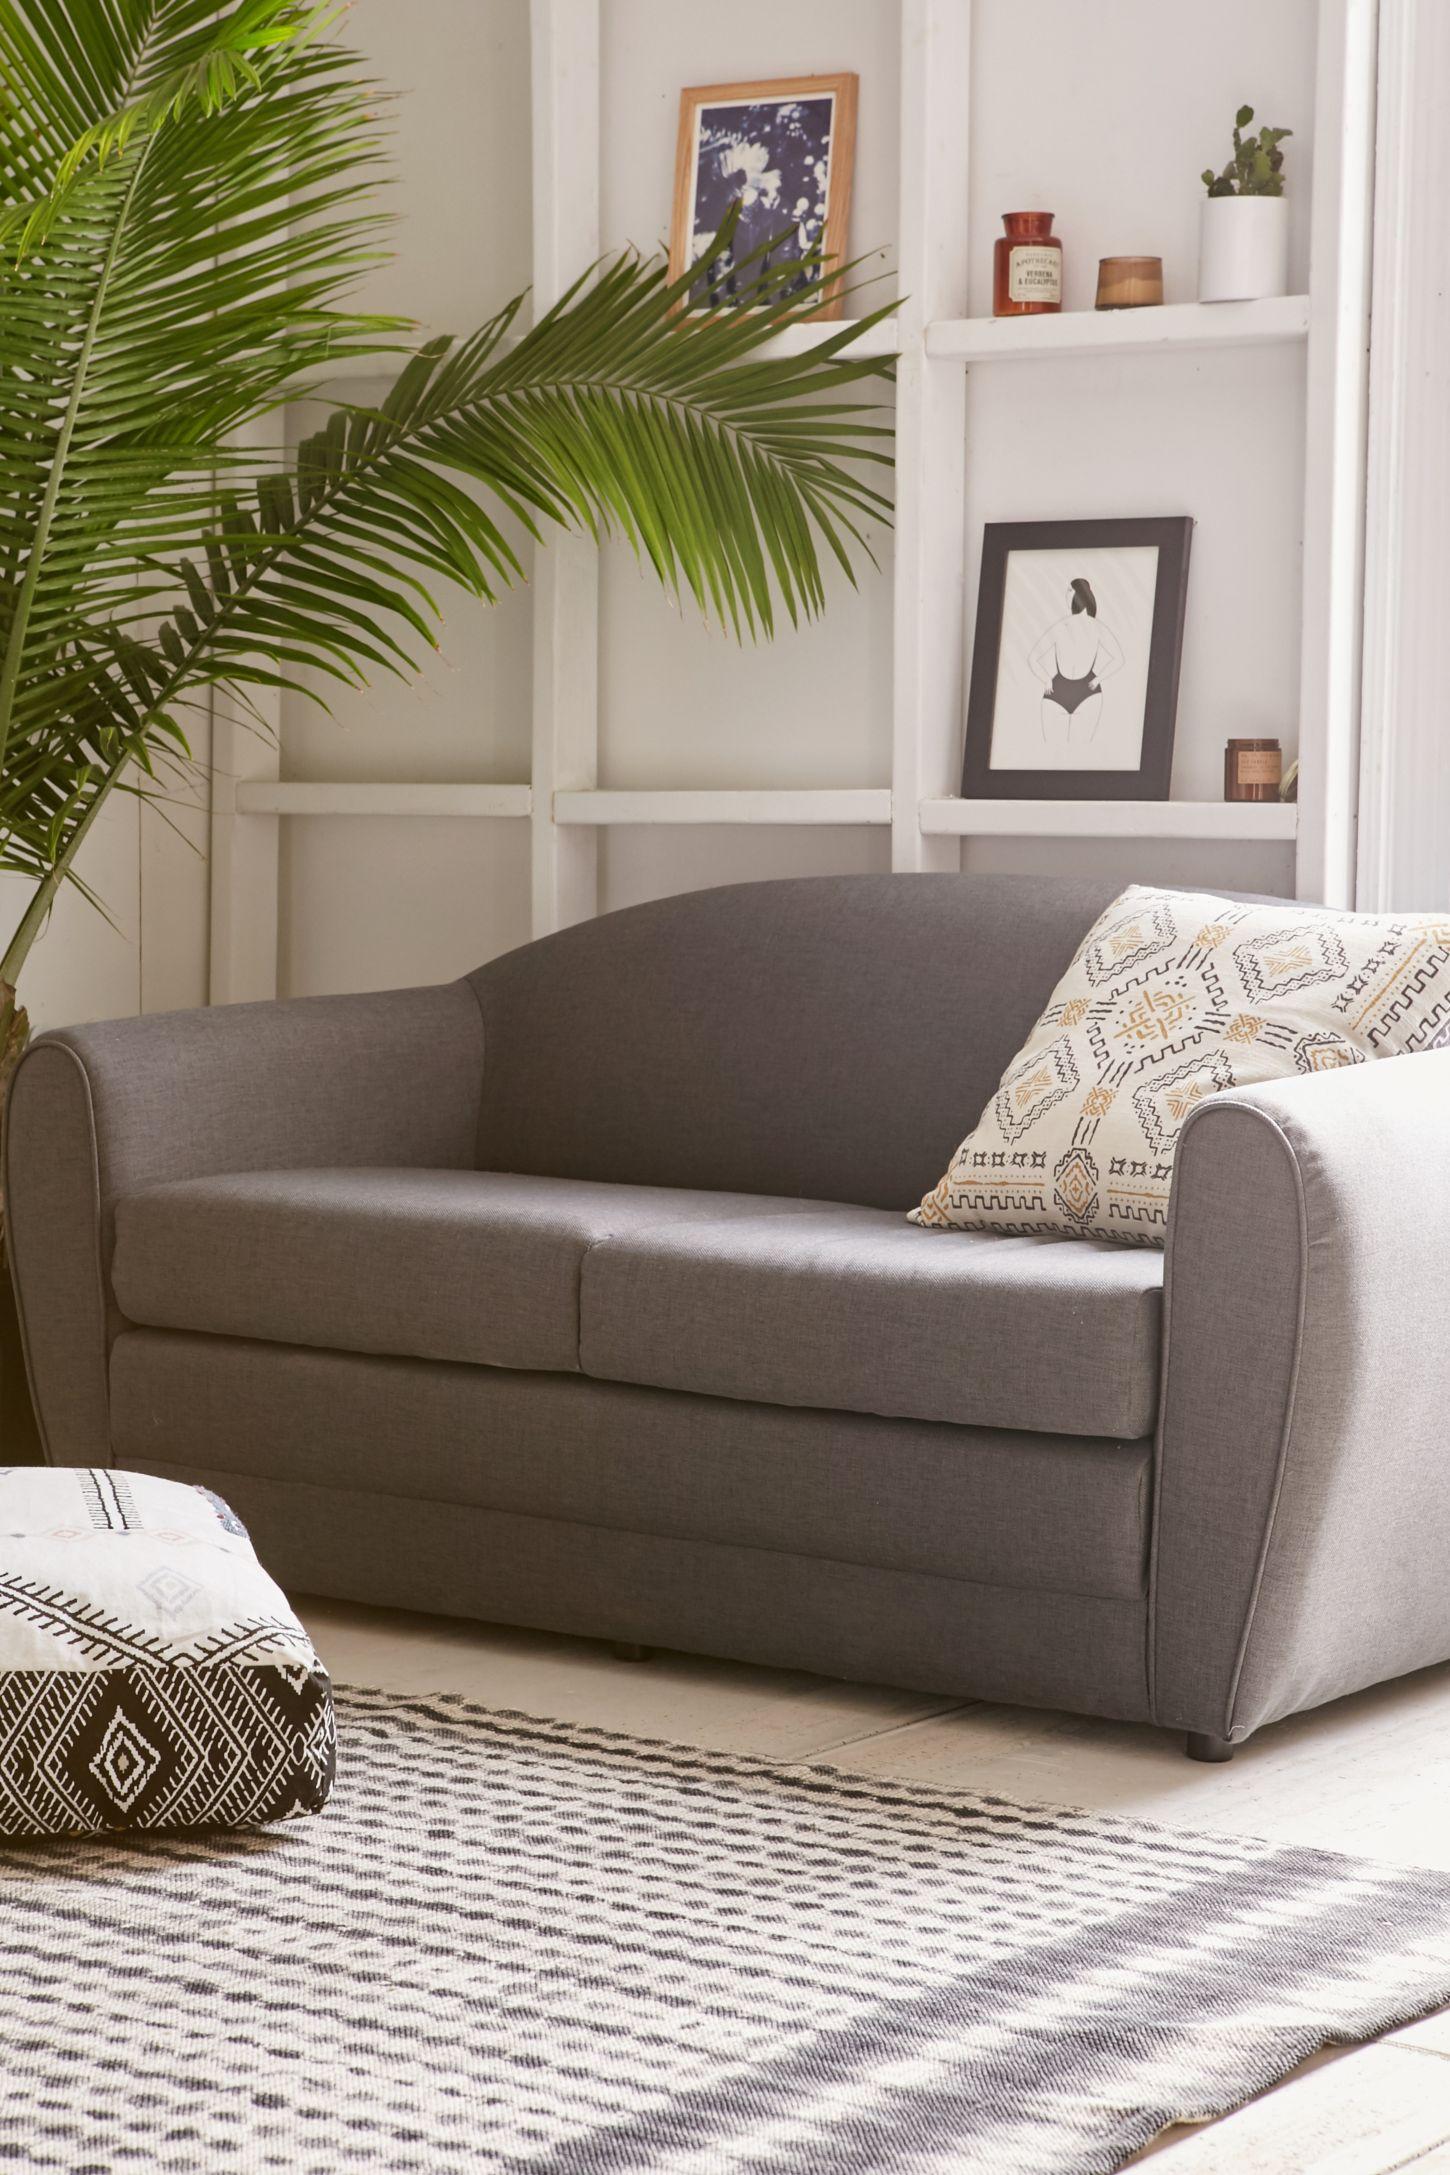 100 sofa bed urban outfitters deco convertible sofa urban o